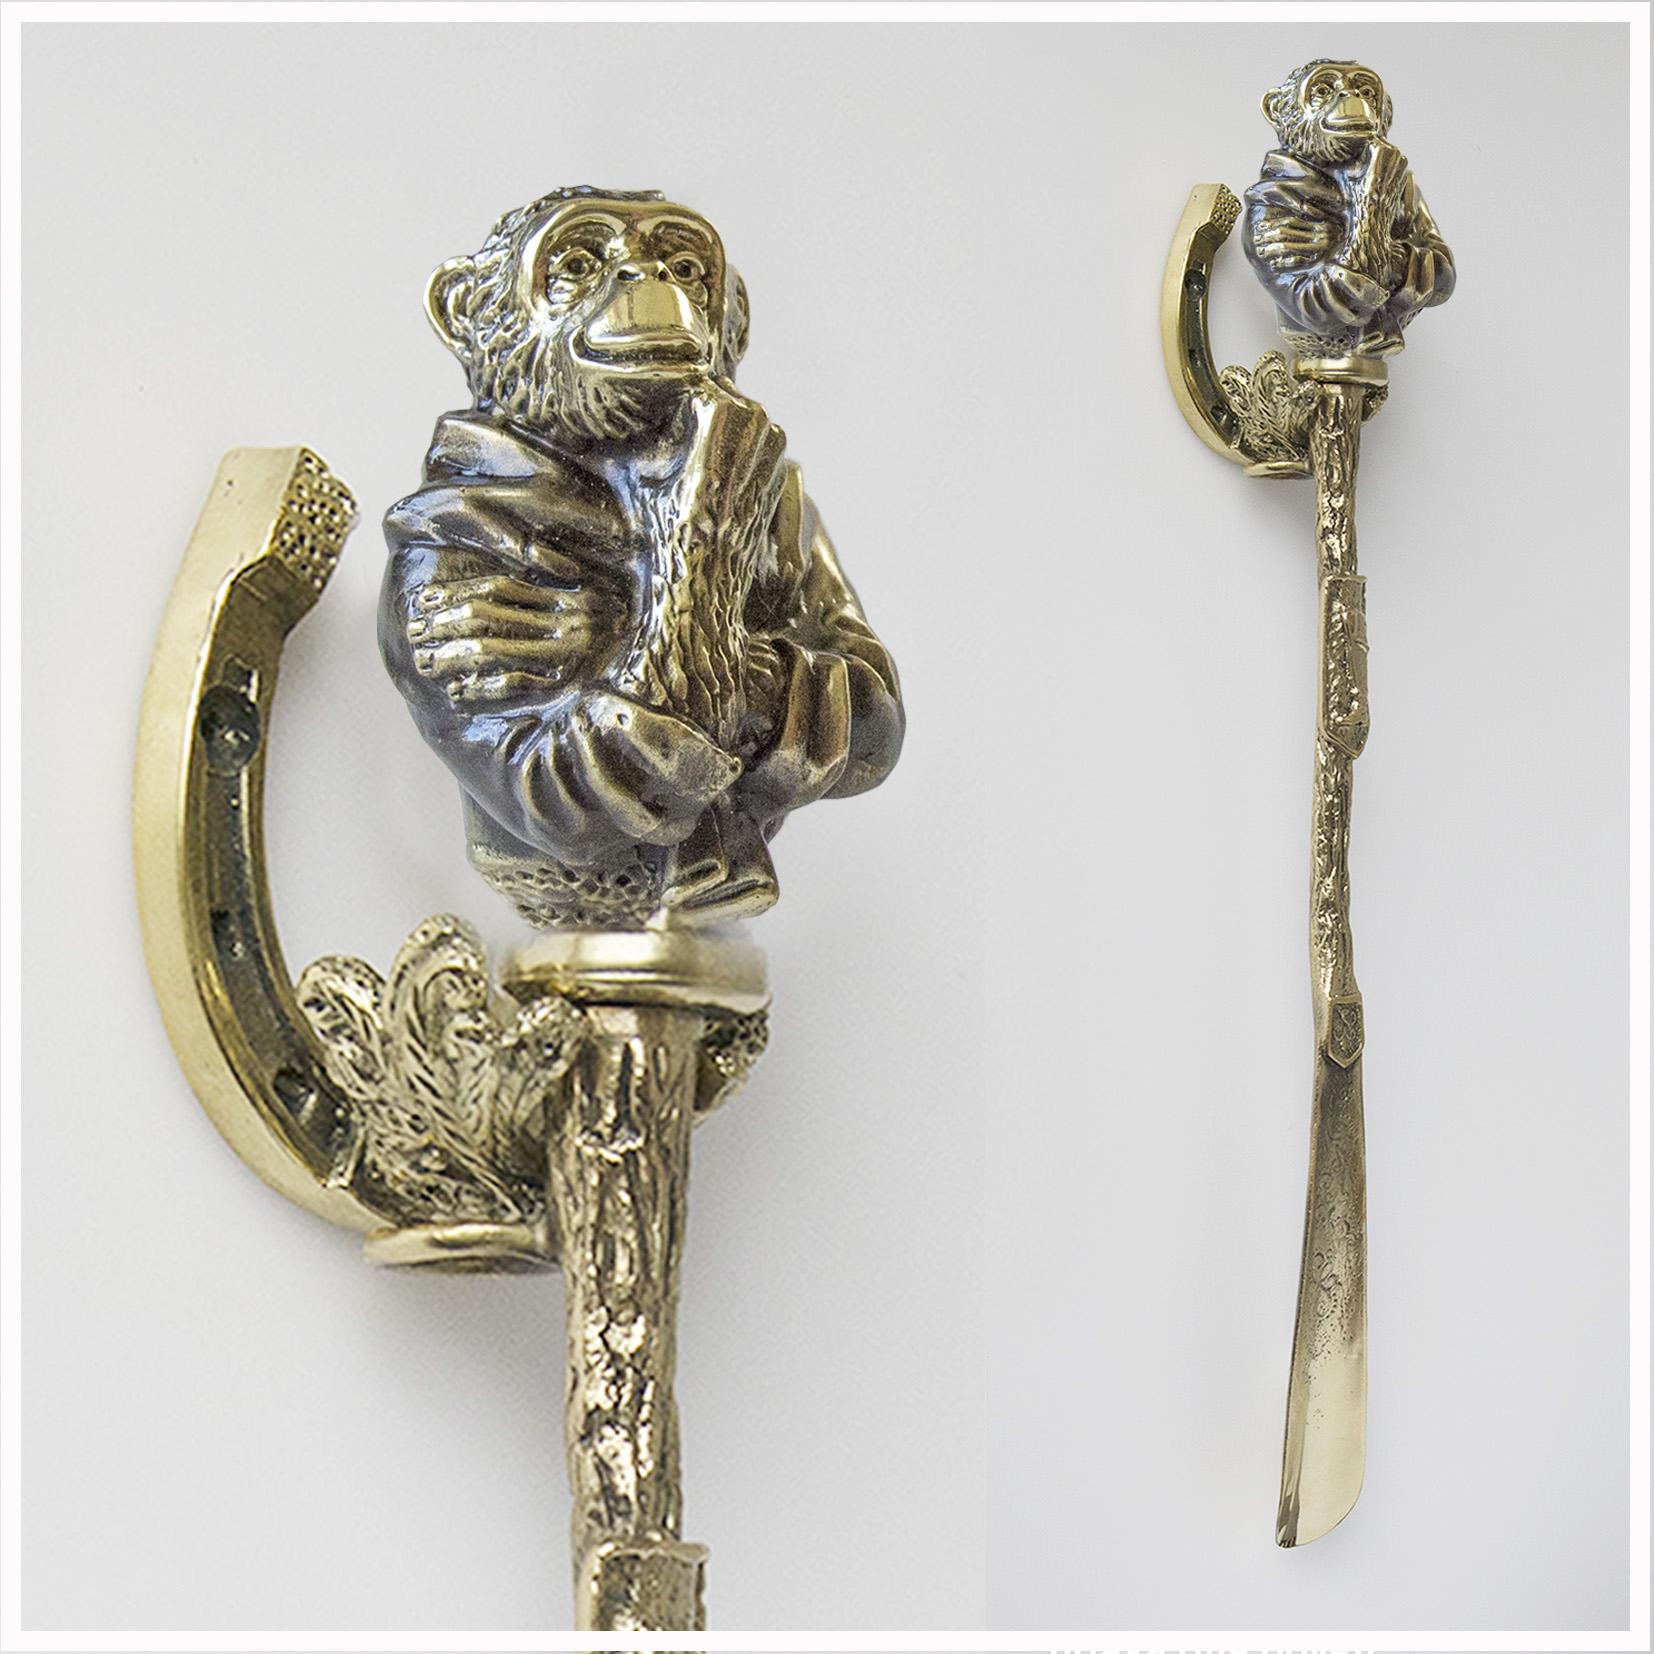 Ложка для обуви обезьяна